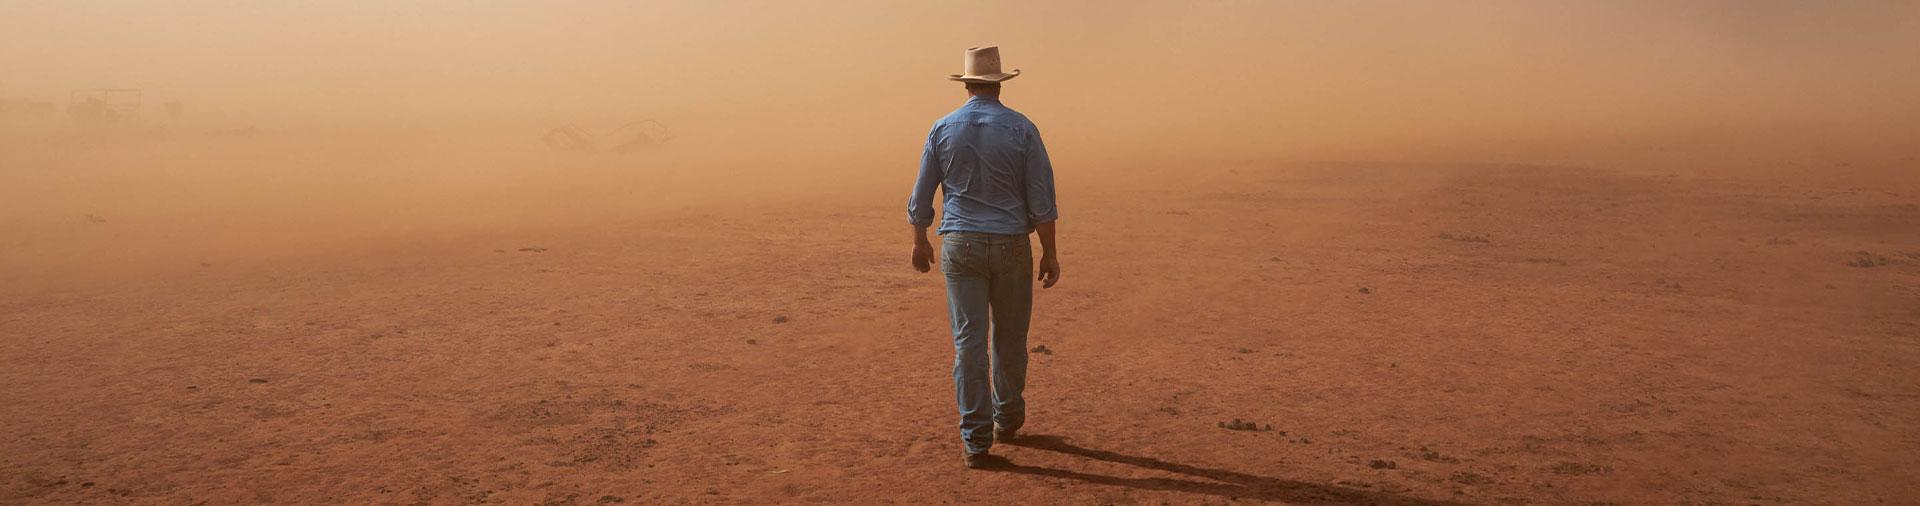 a-farmer-walks-into-a-dust-storm-lacking-a-horizon